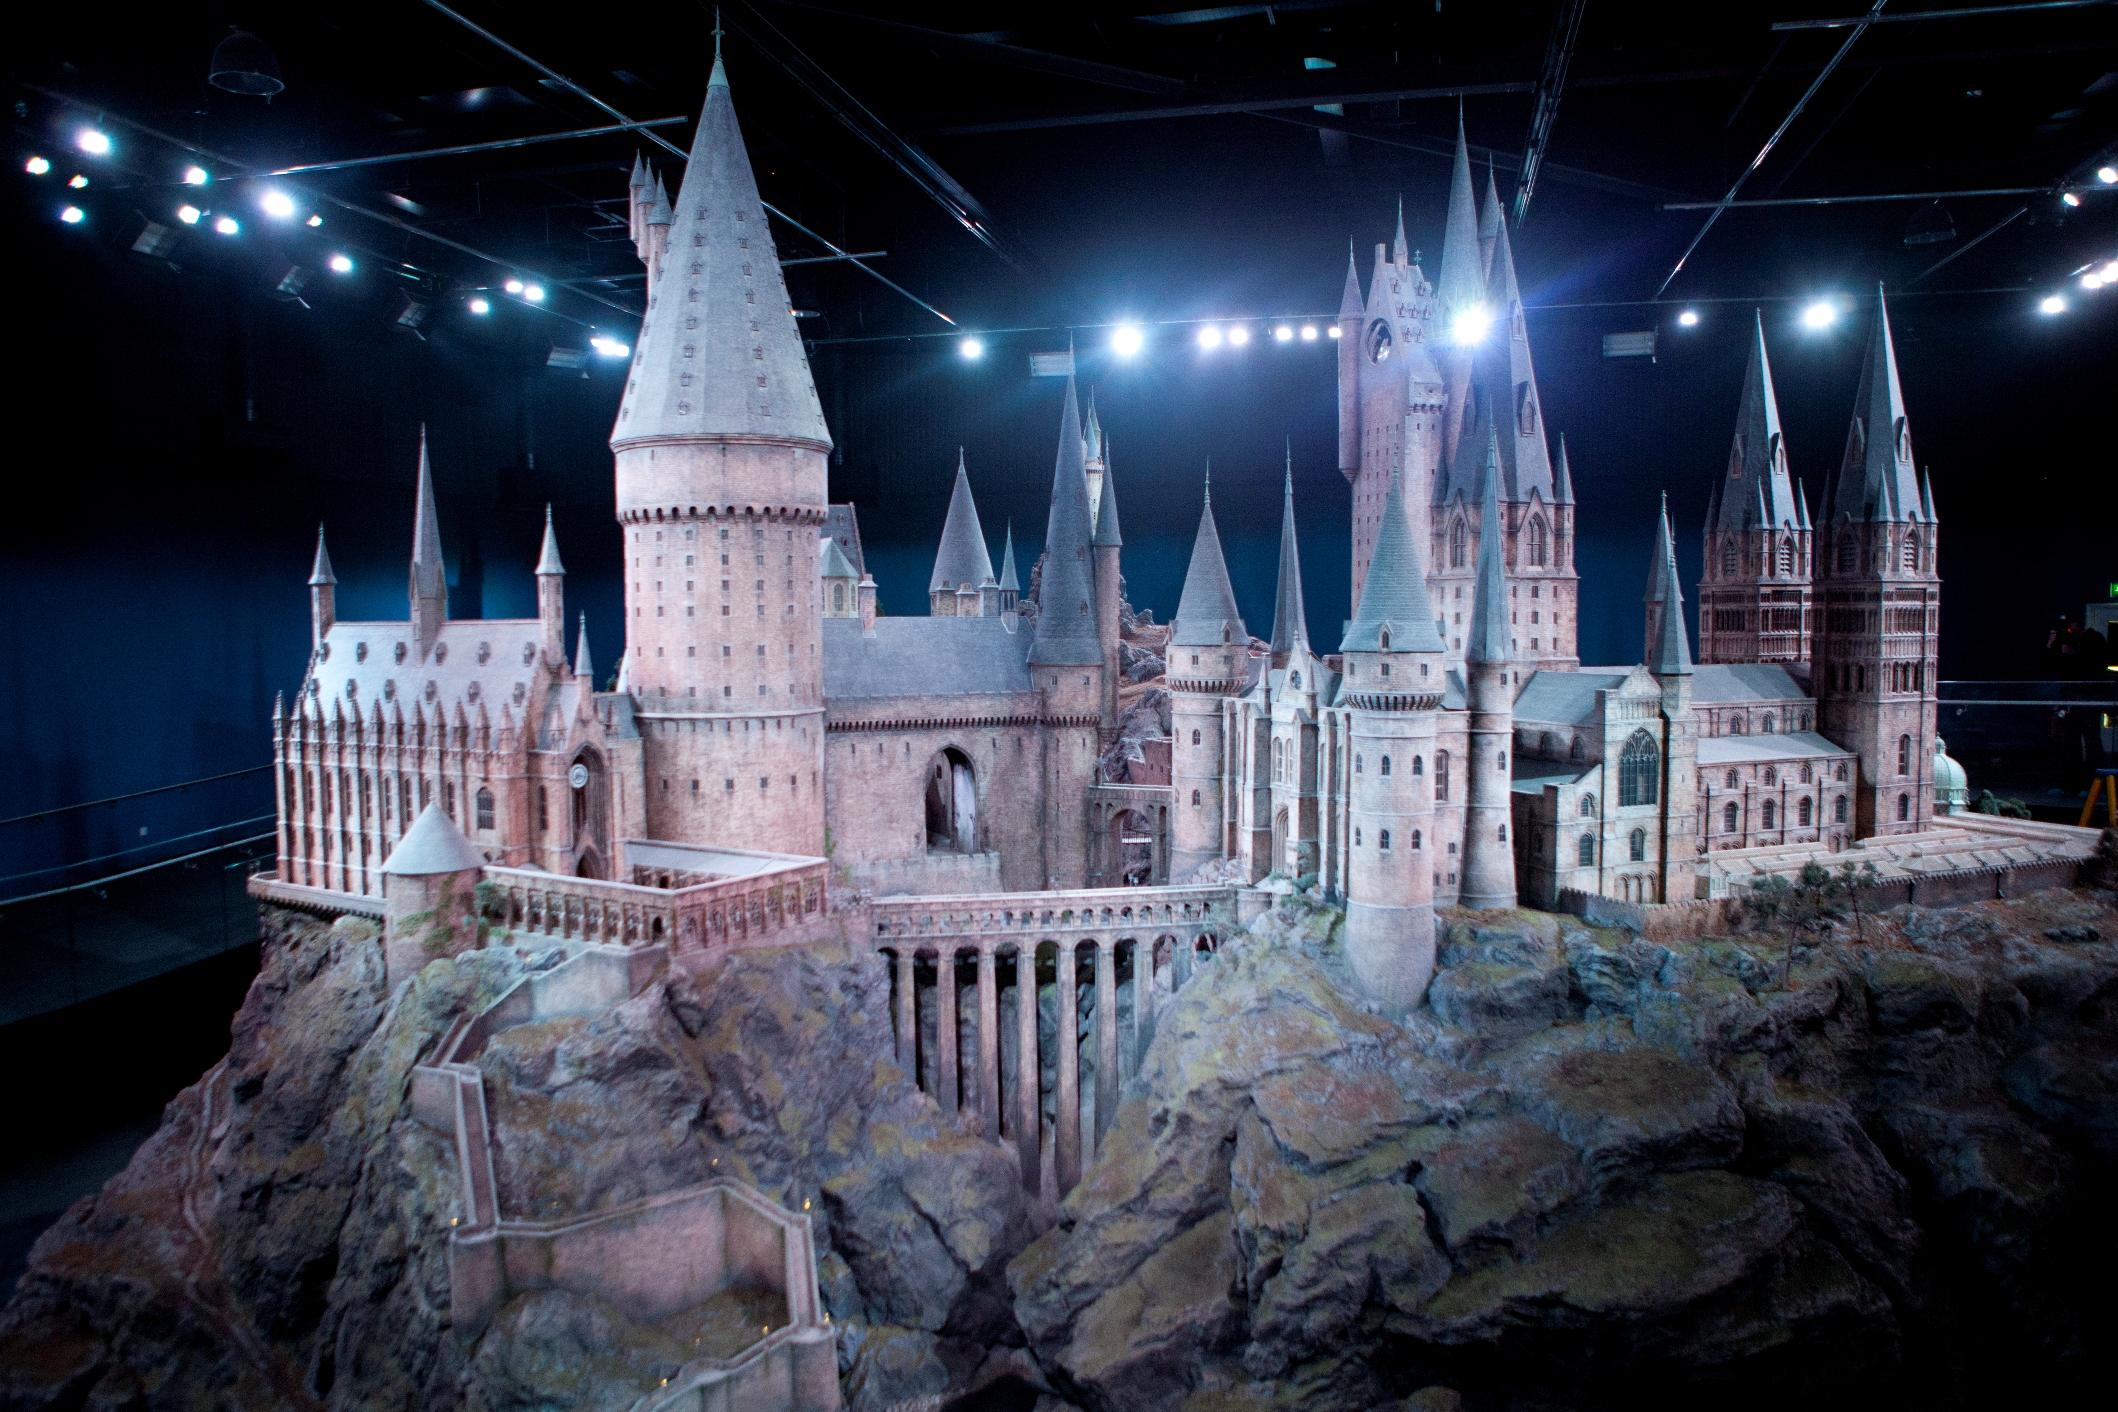 Harry Potter Studio Tour at Leavesdon